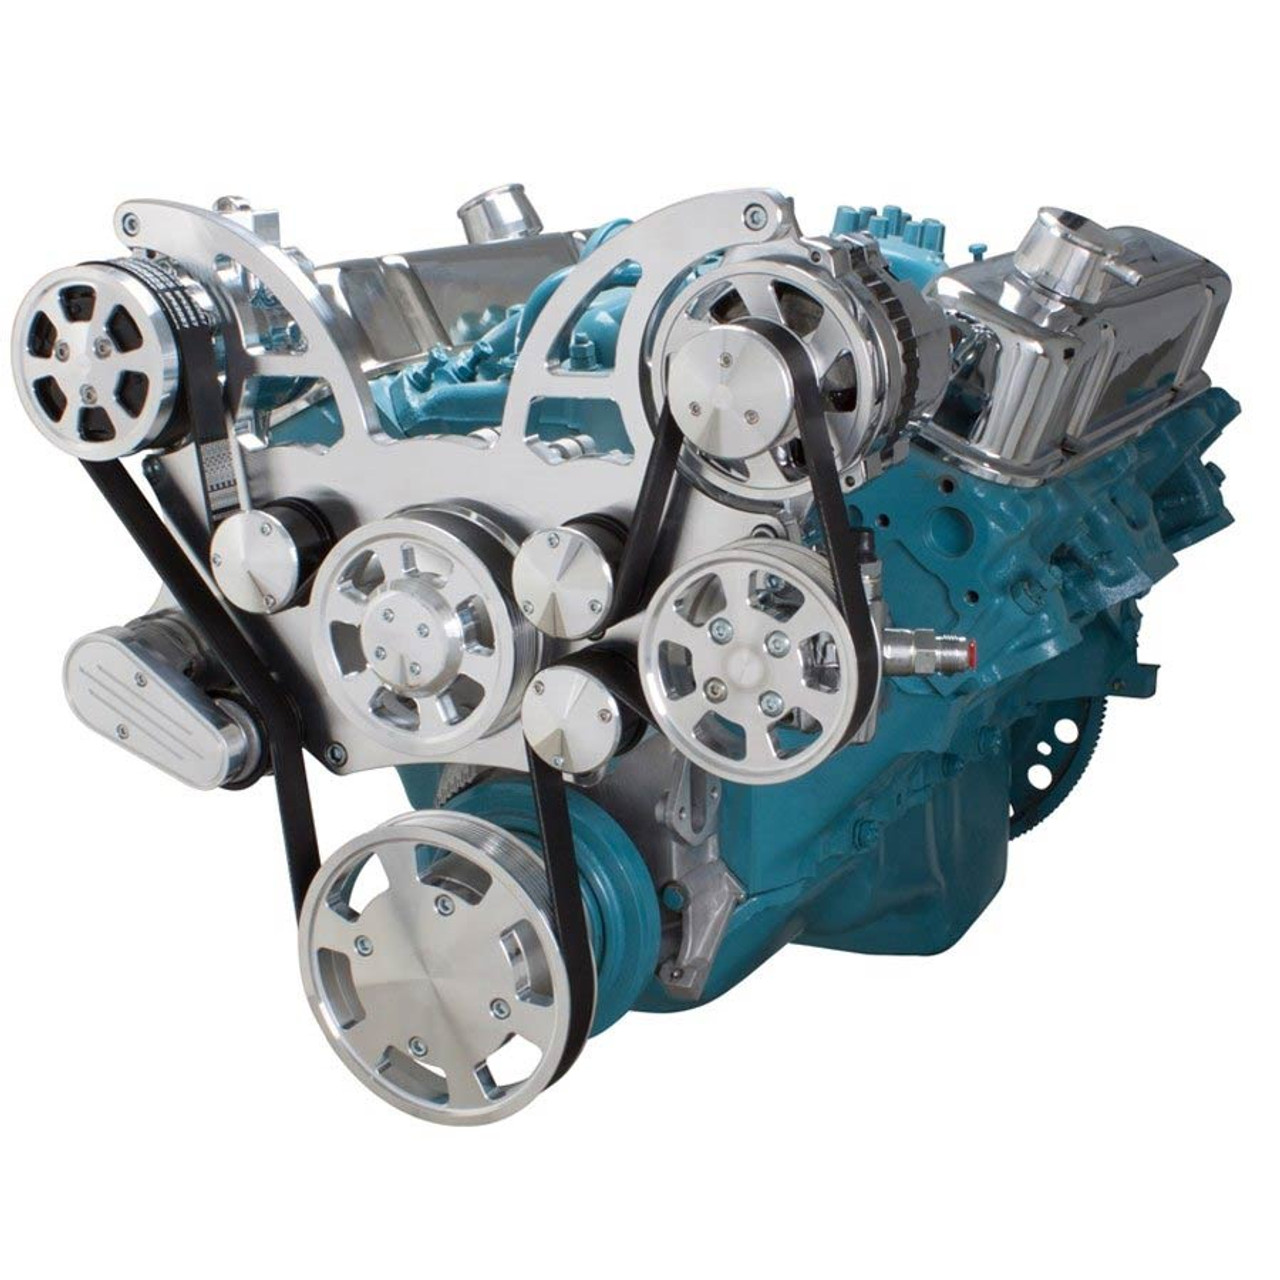 small resolution of serpentine conversion kit for pontiac 350 400 428 455 v8 engines 2001 lexus is300 engine diagram pontiac 350 engine diagram